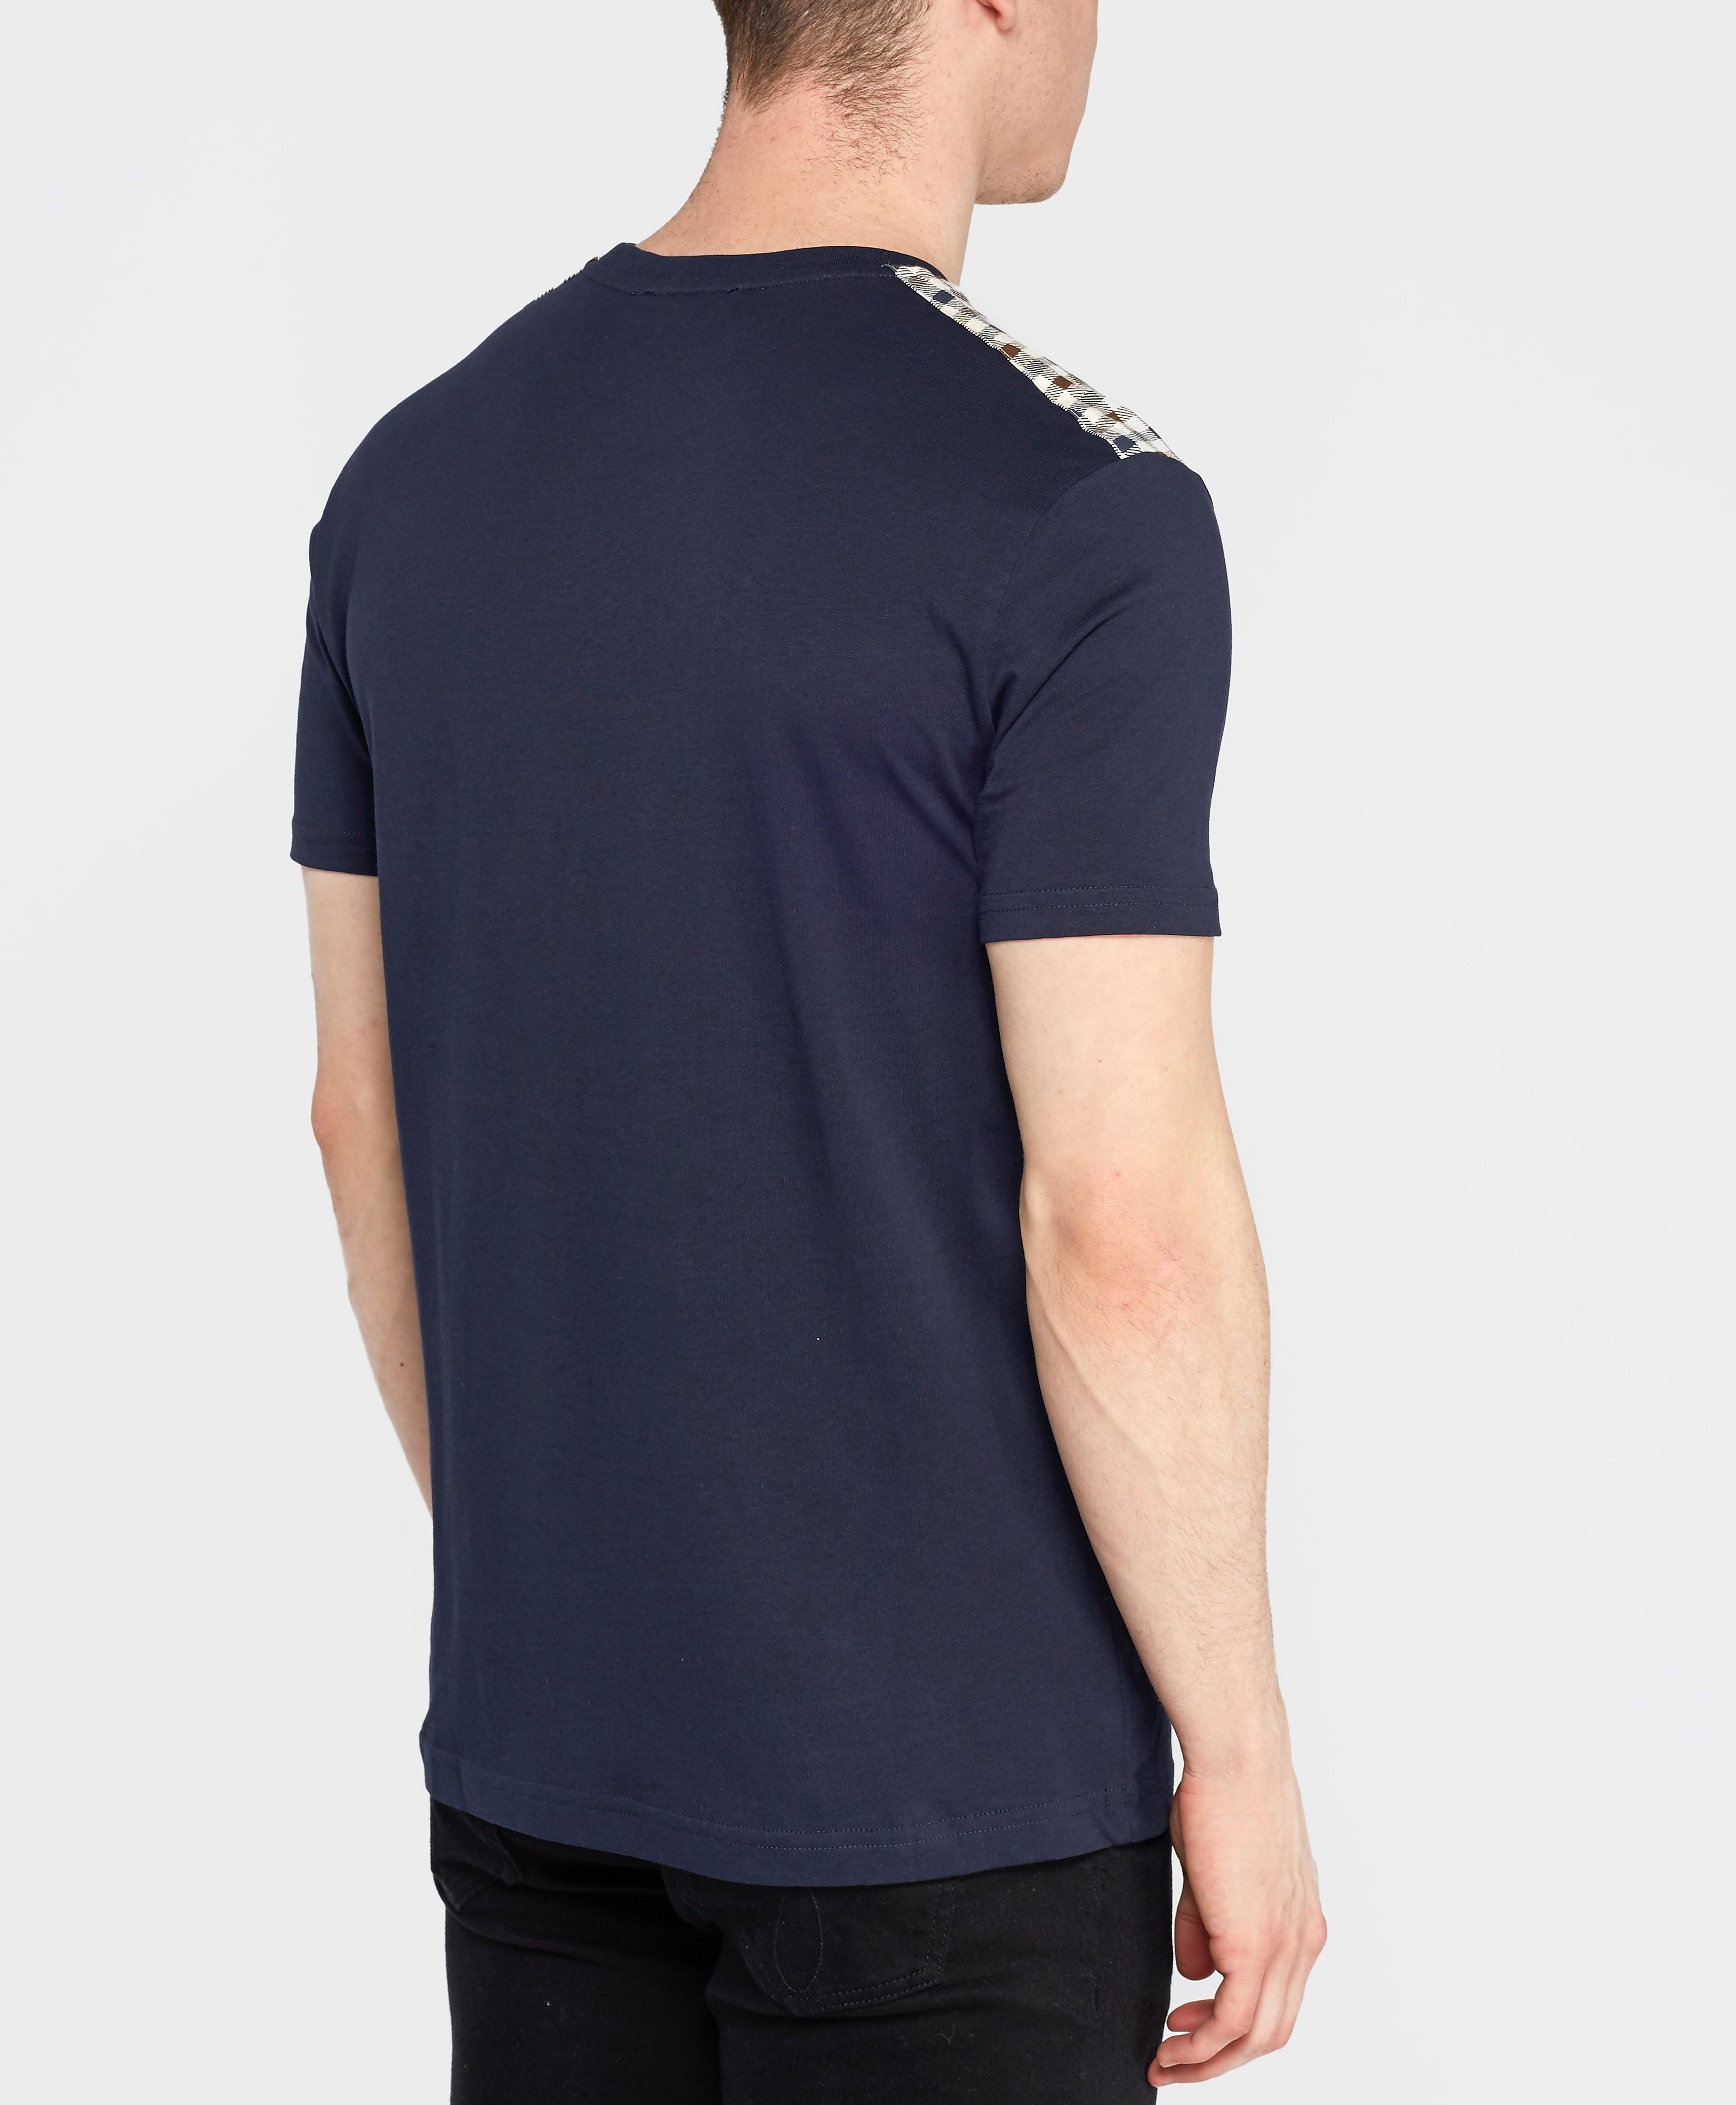 Aquascutum Check Shoulder Short Sleeve T-Shirt